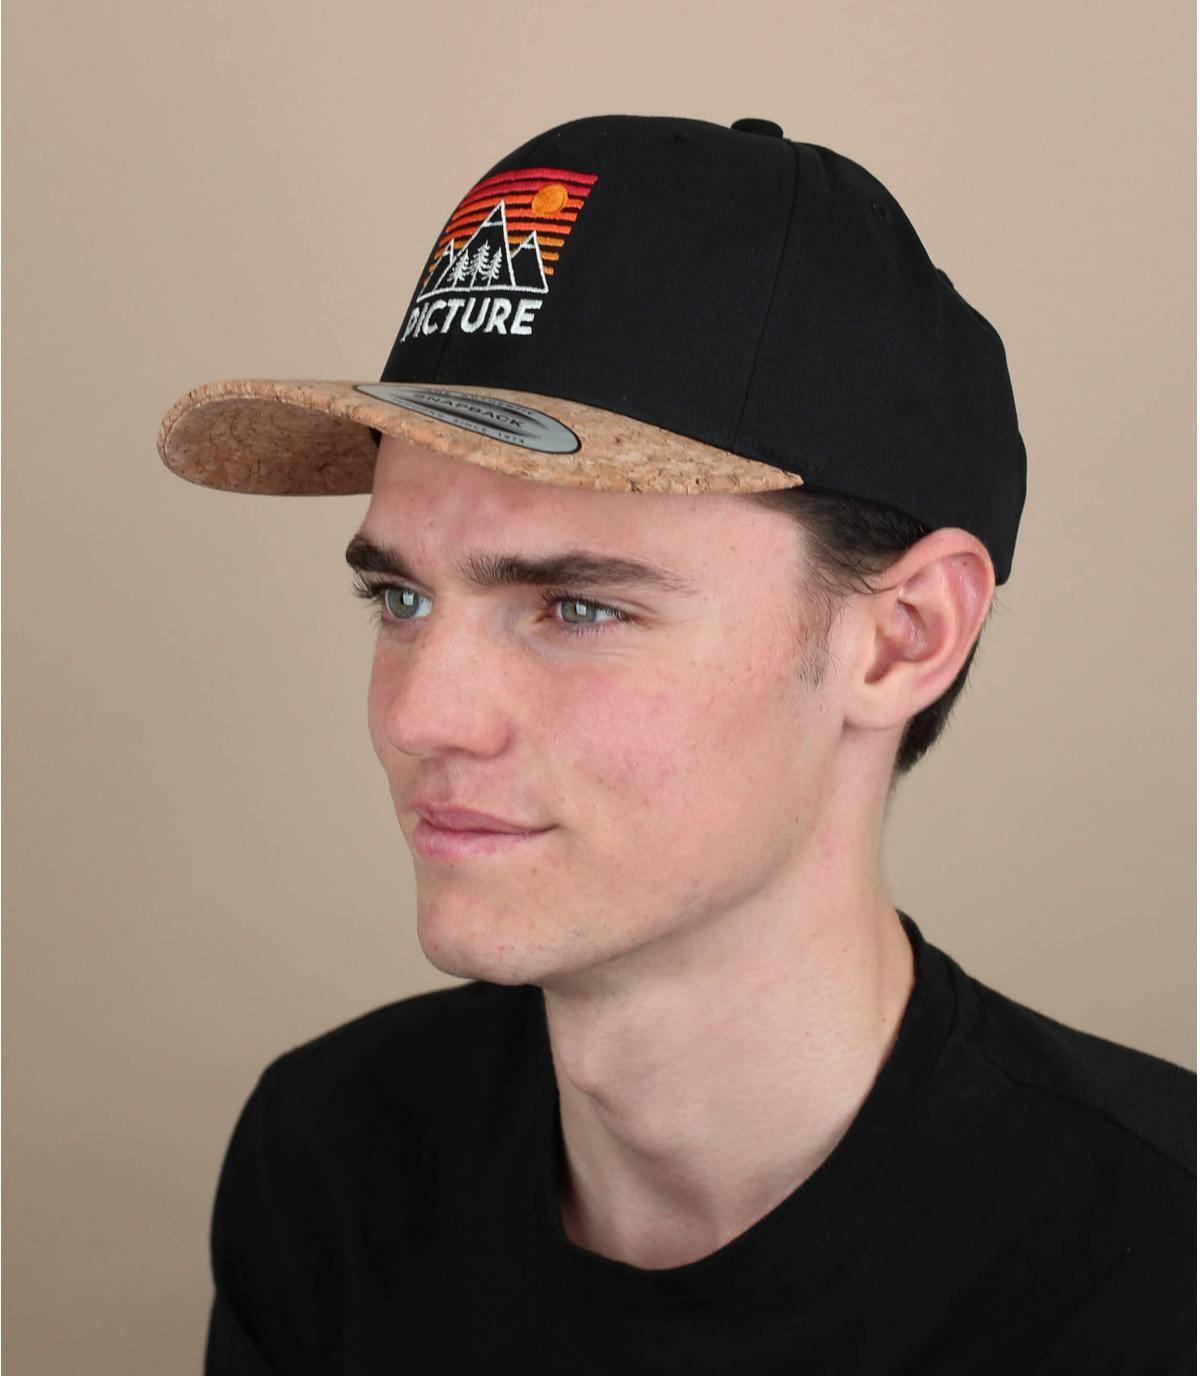 zwarte Picture cap